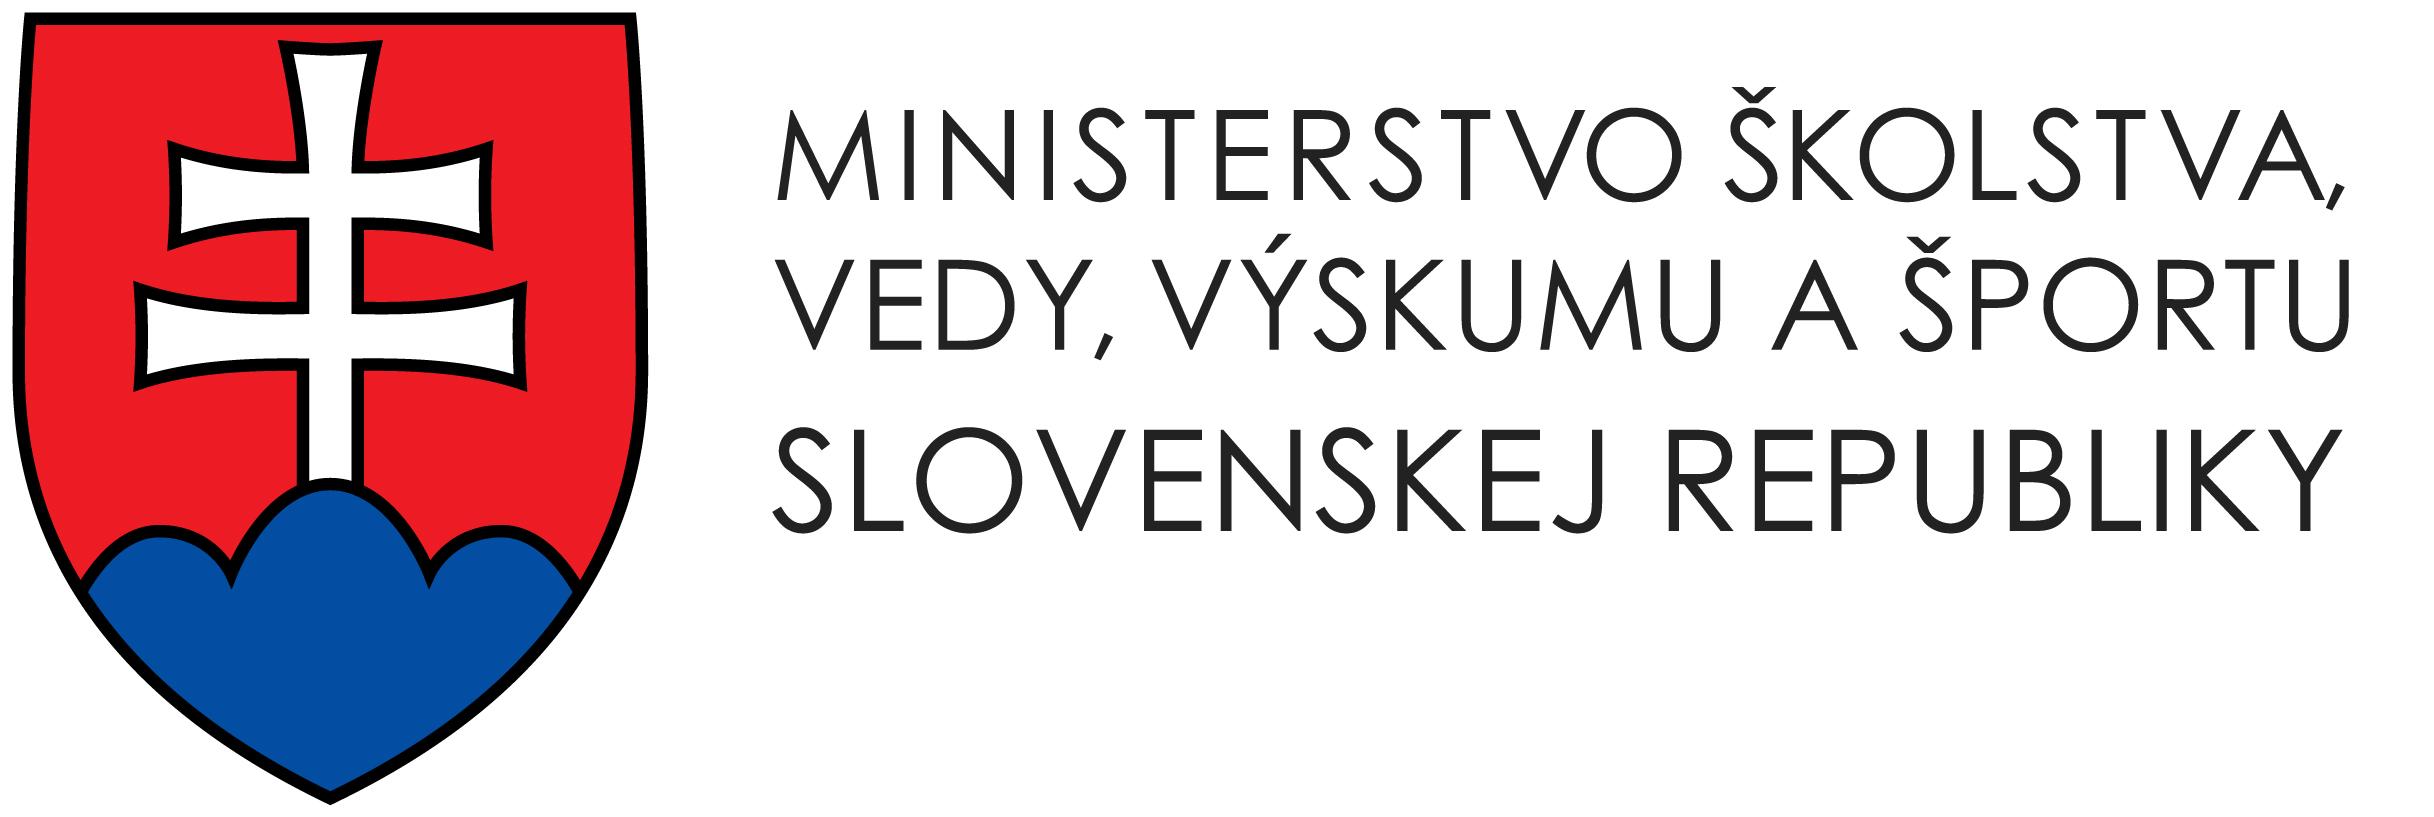 Ministerstvo Skolstva